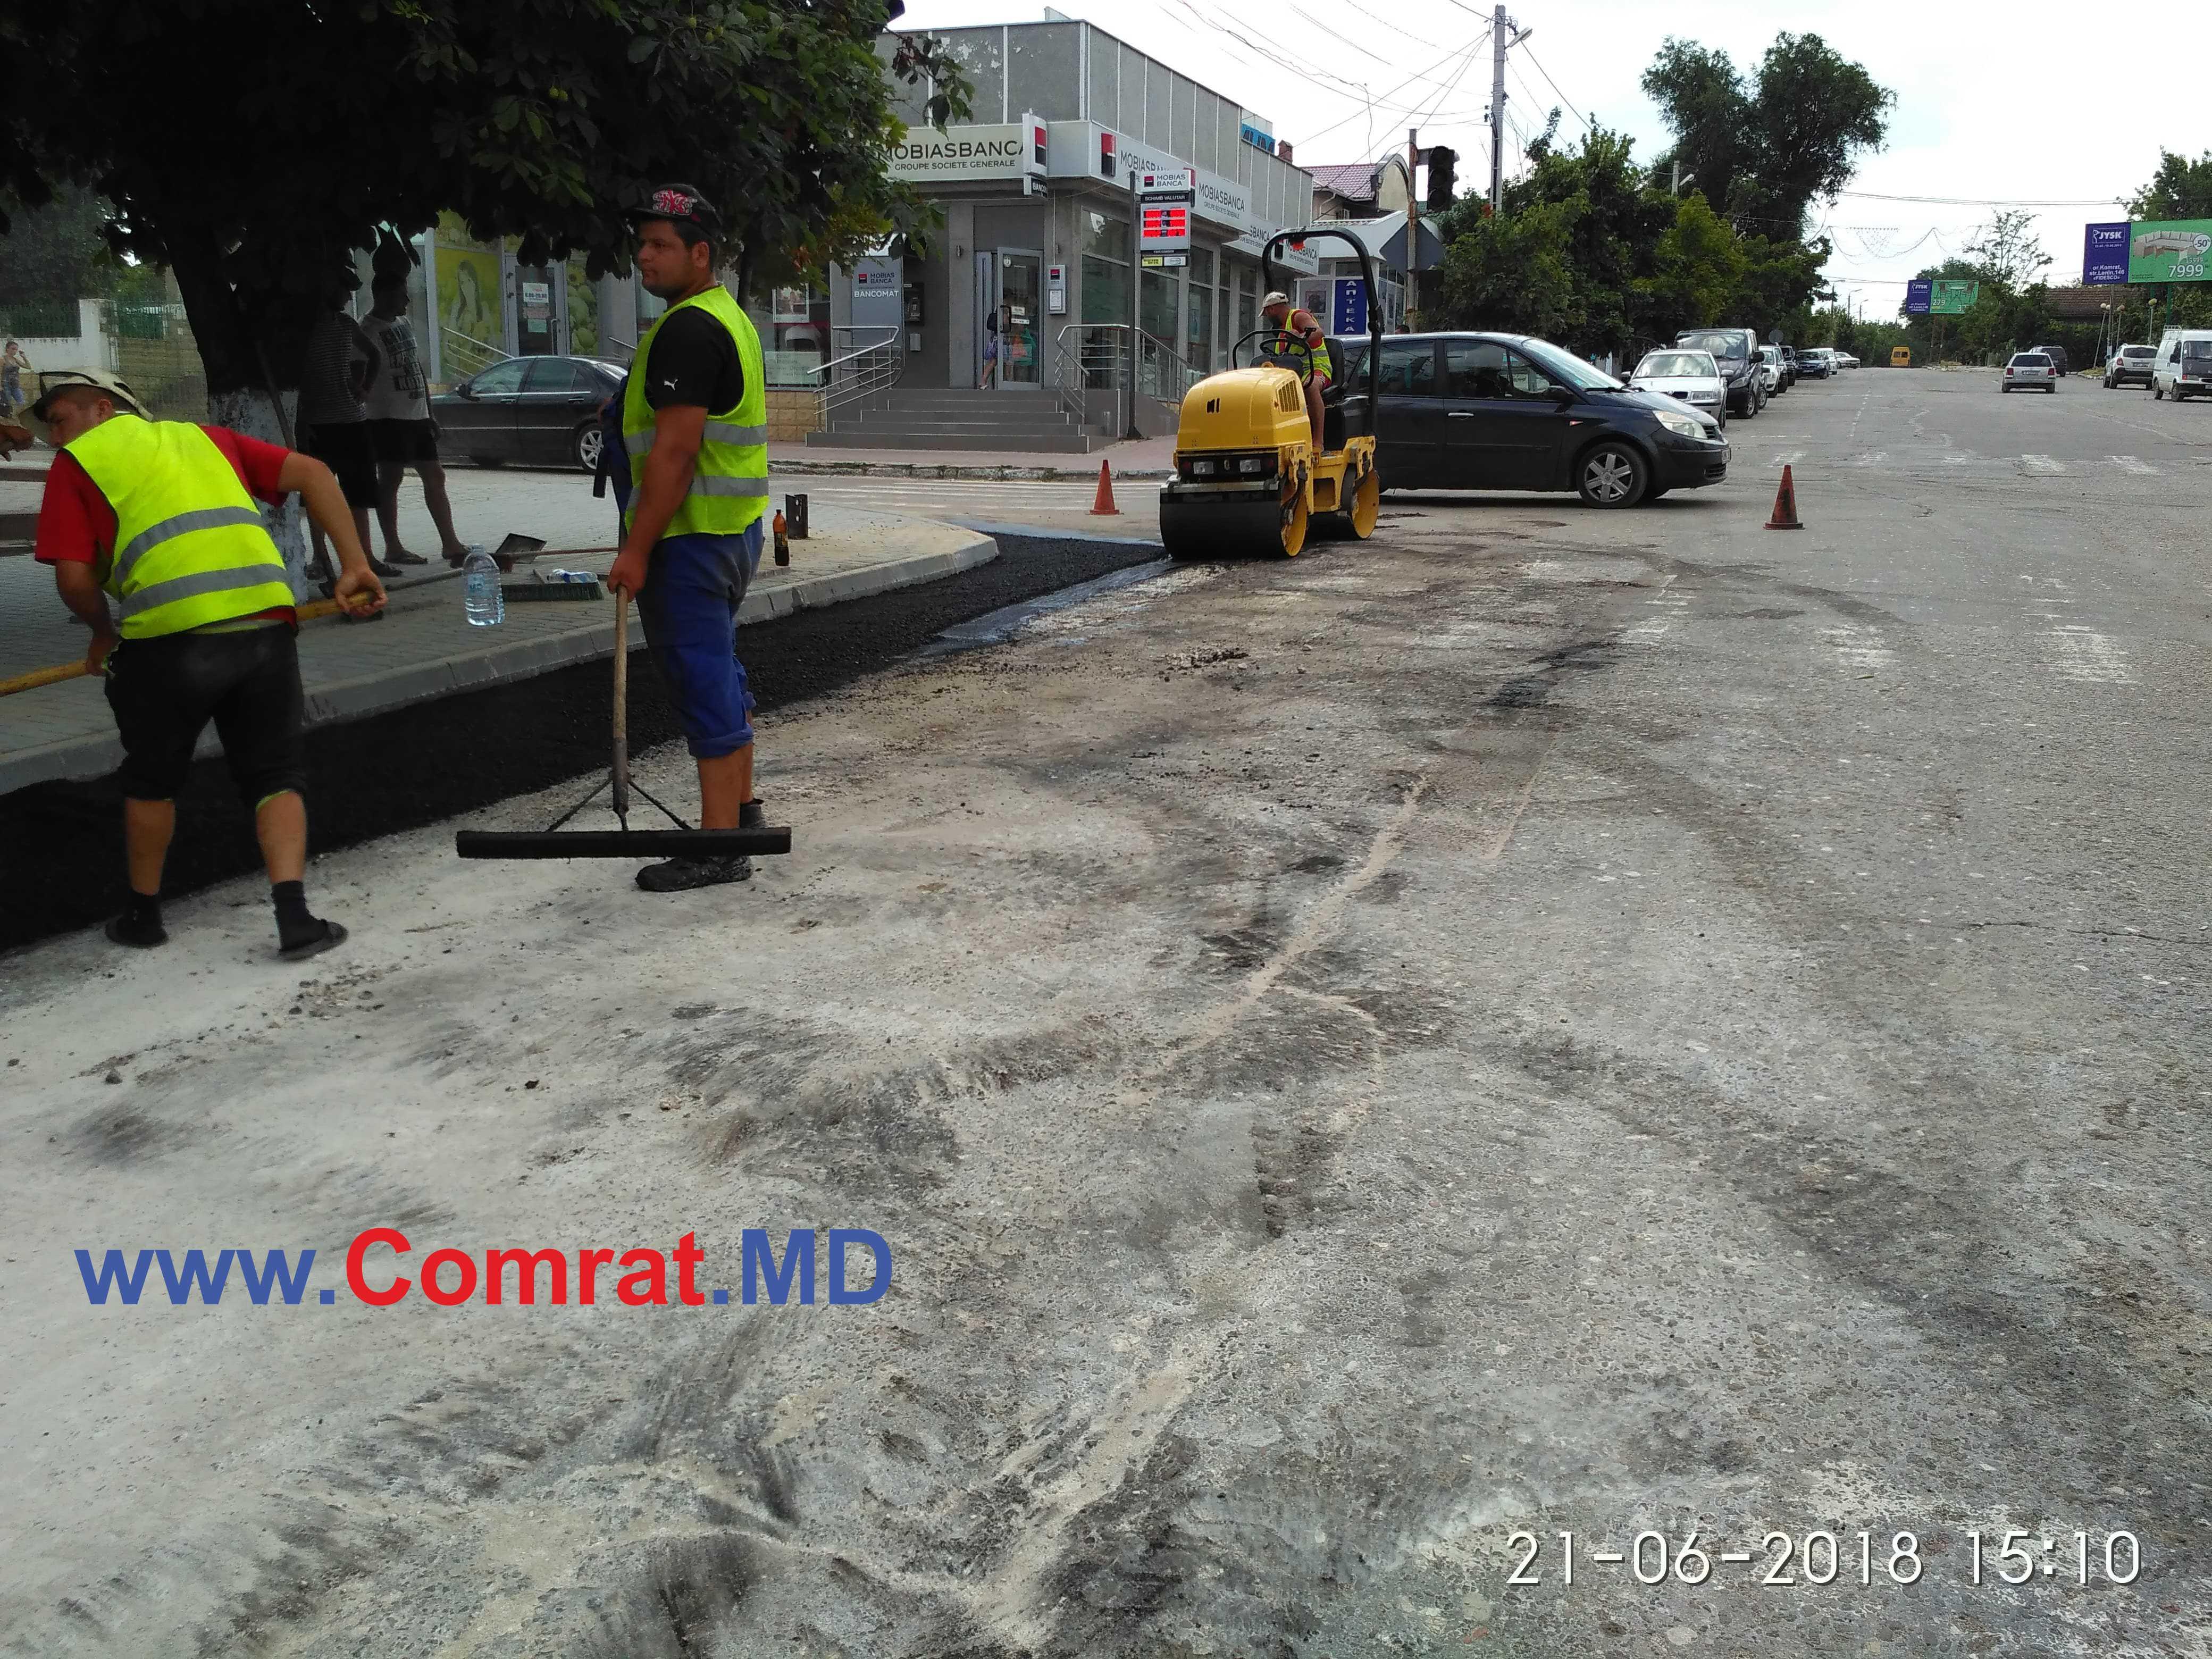 Продолжаются работы по ремонту дороги на ул.Третьякова м.Комрат(фоторепортаж)